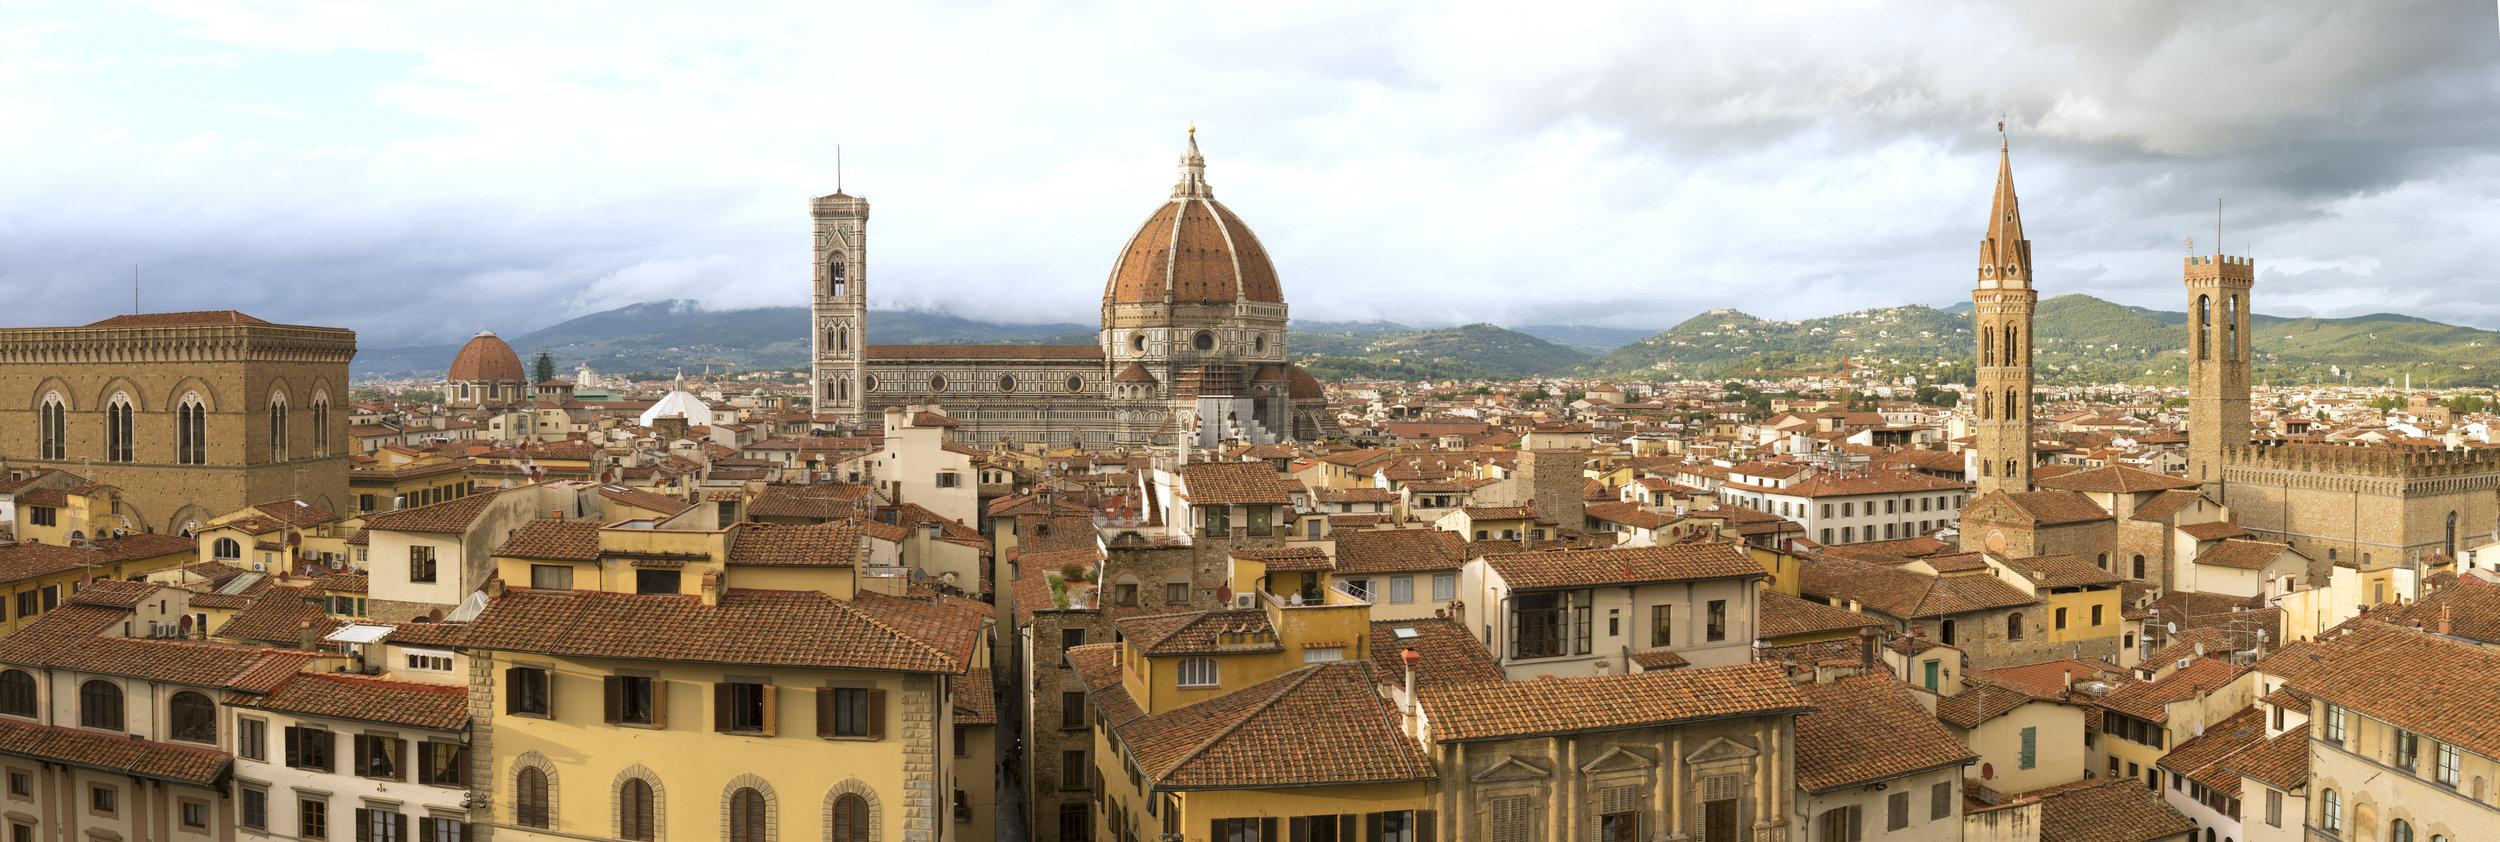 Panorama_Florence_Med.jpg